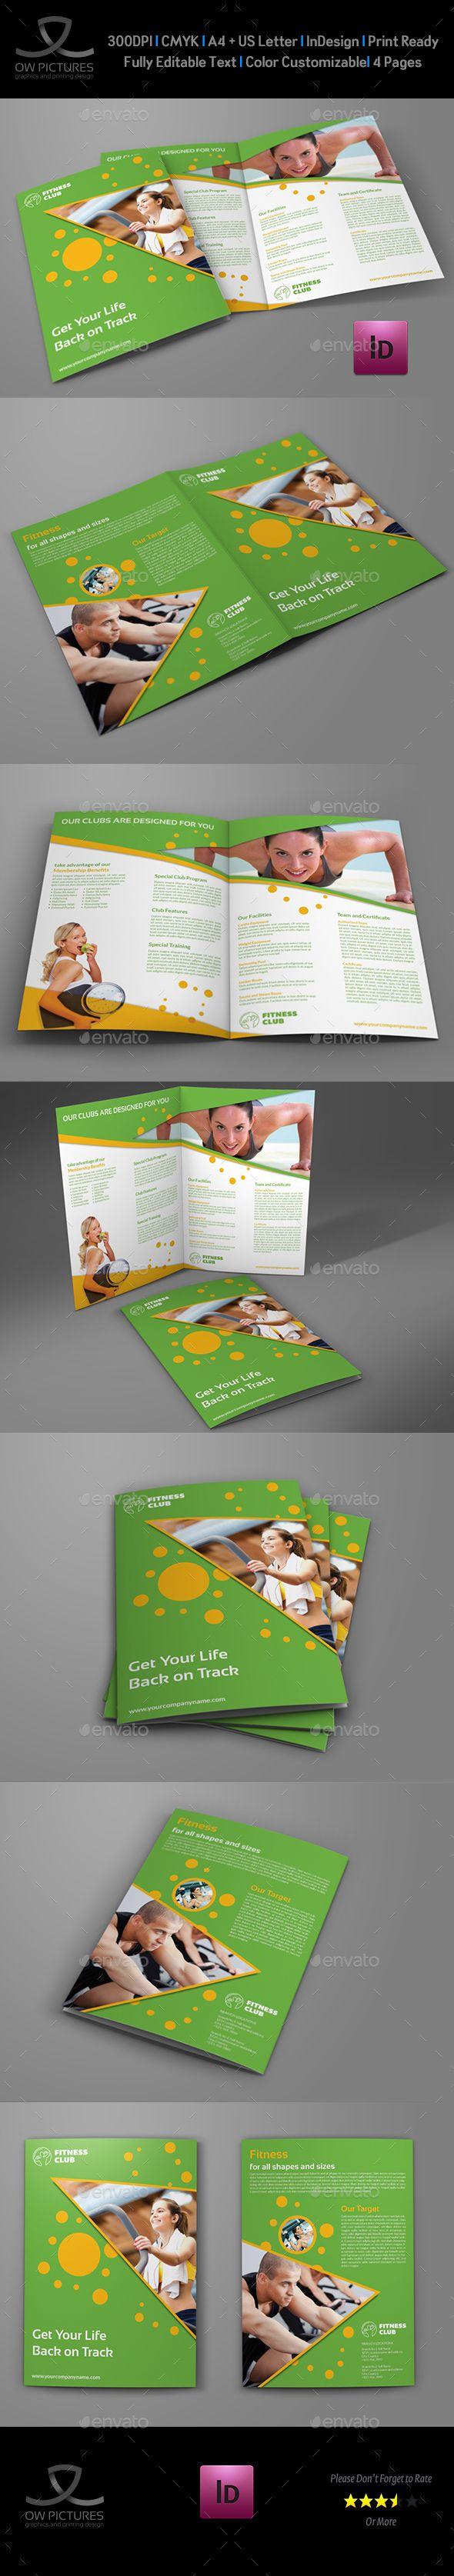 Fitness  Gym BiFold Brochure Template  Brochure Template